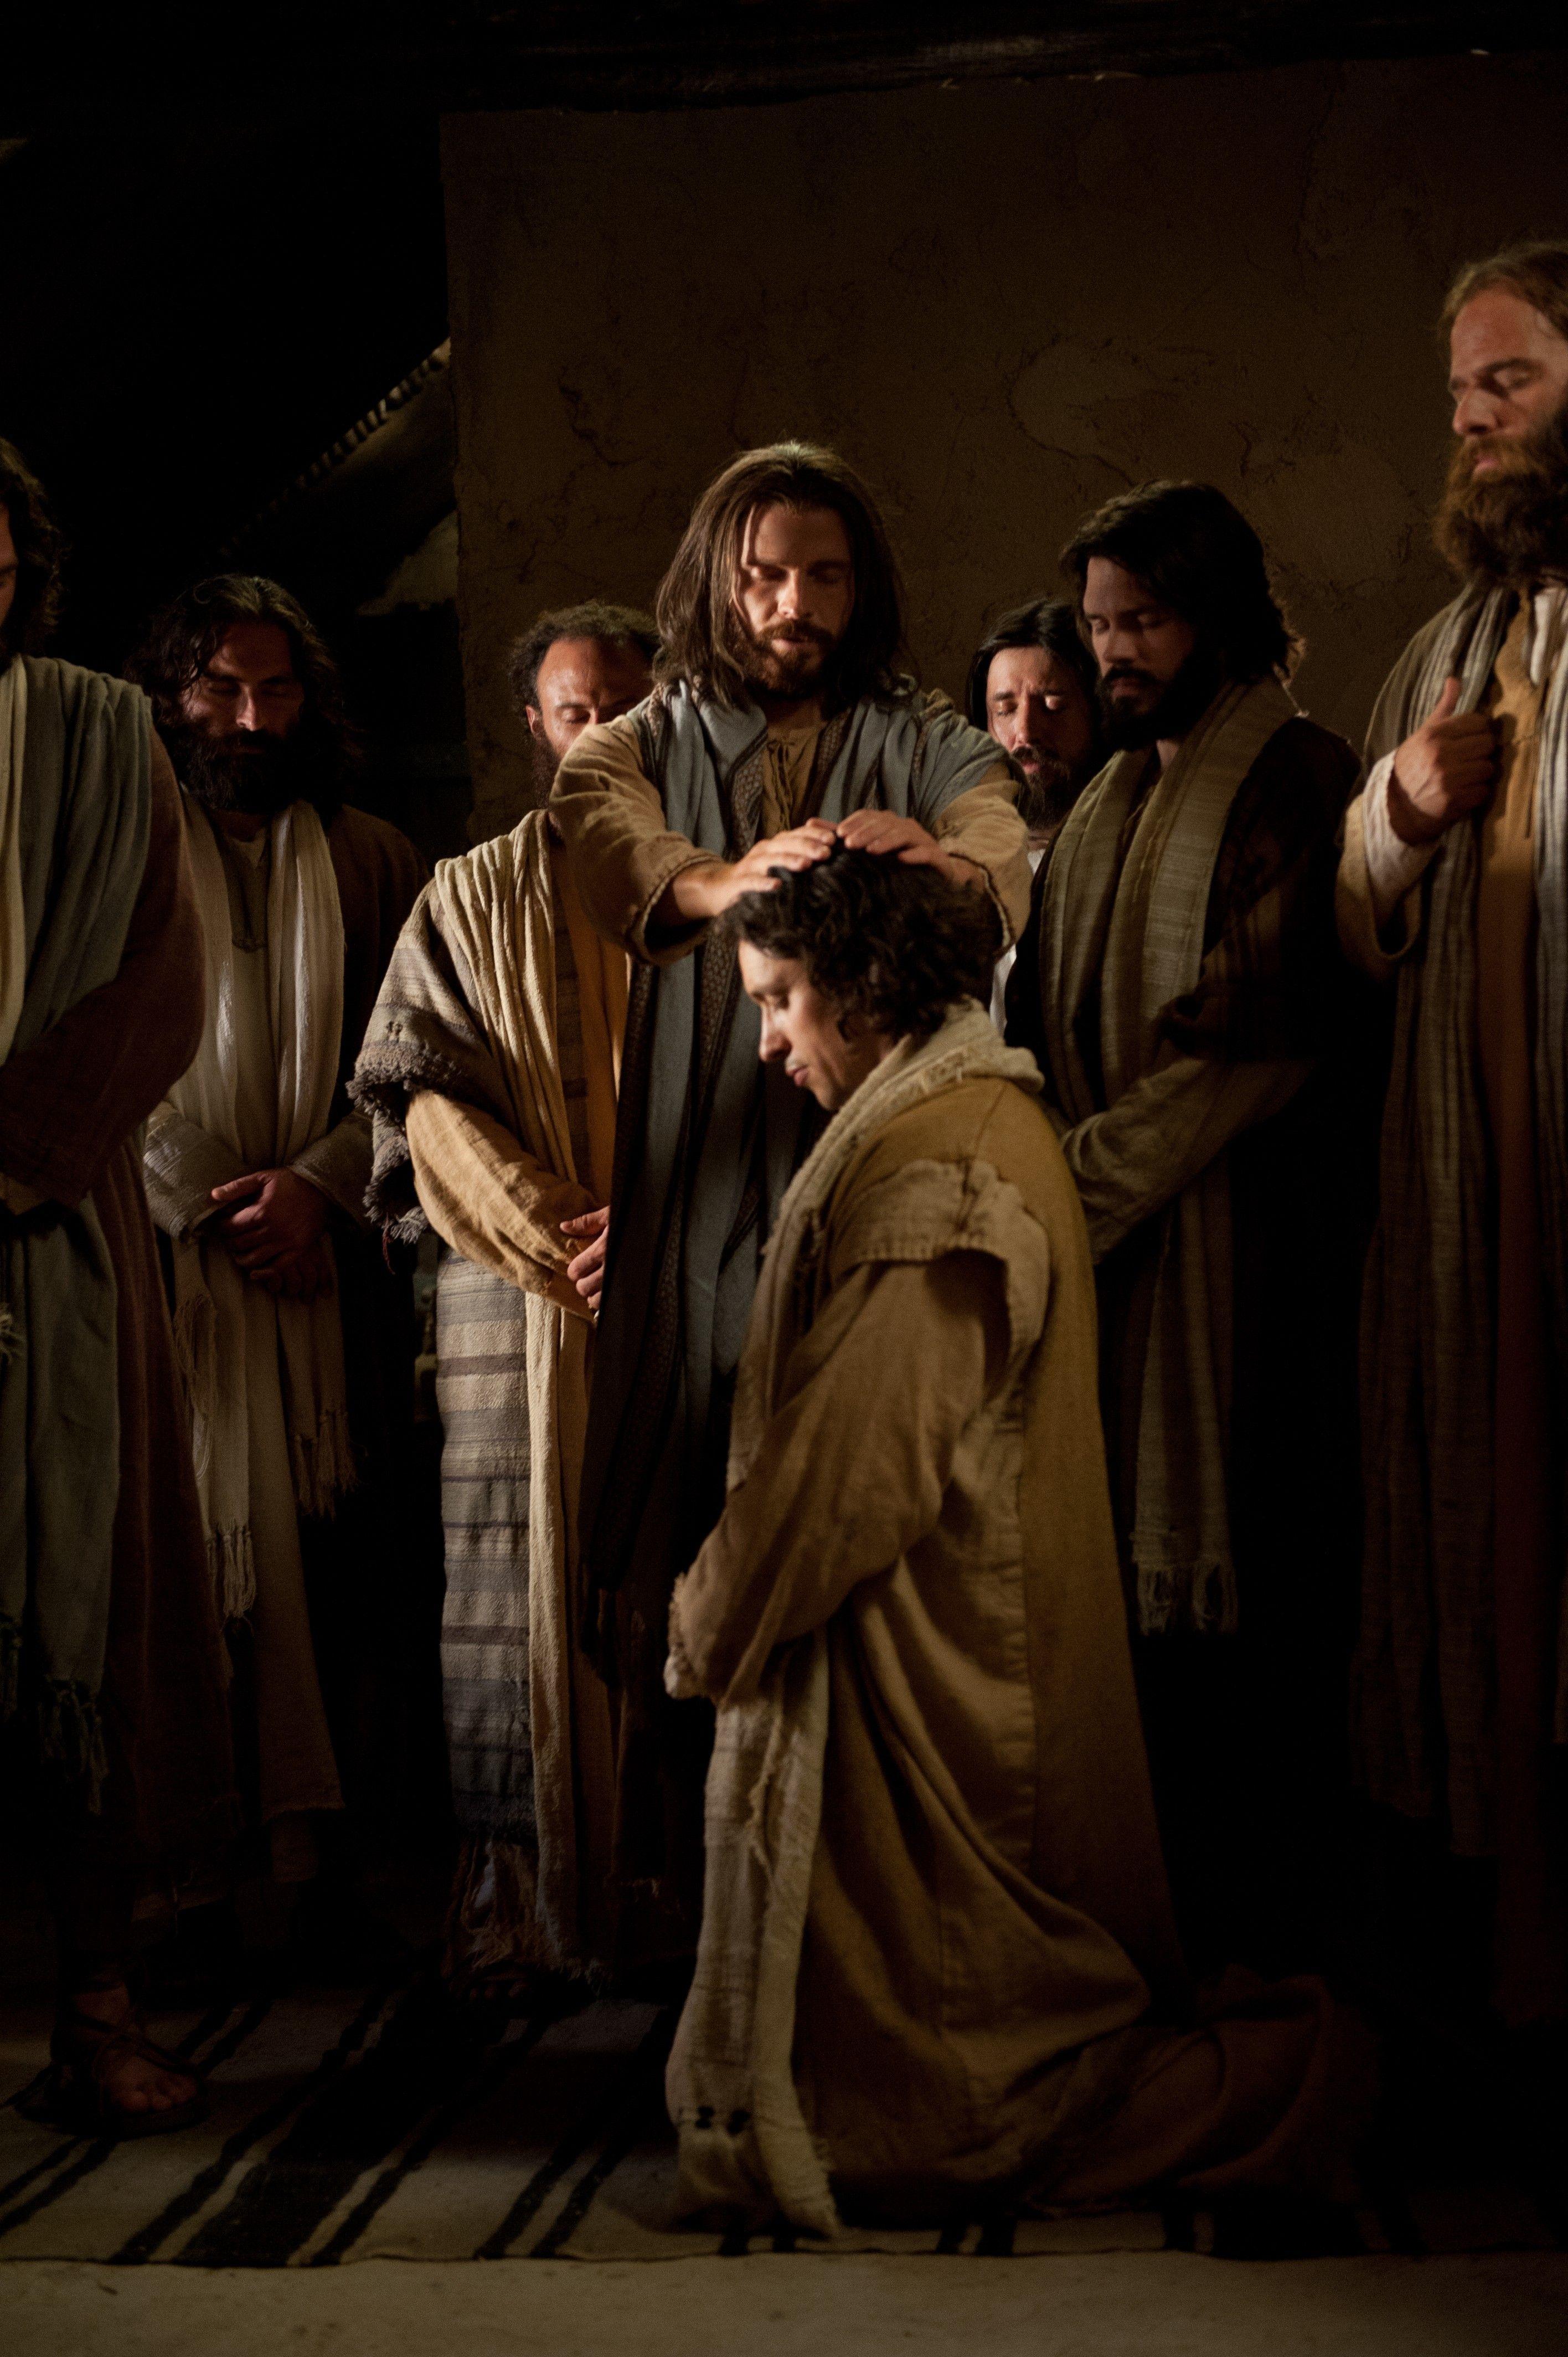 Christ ordaining John as an Apostle.